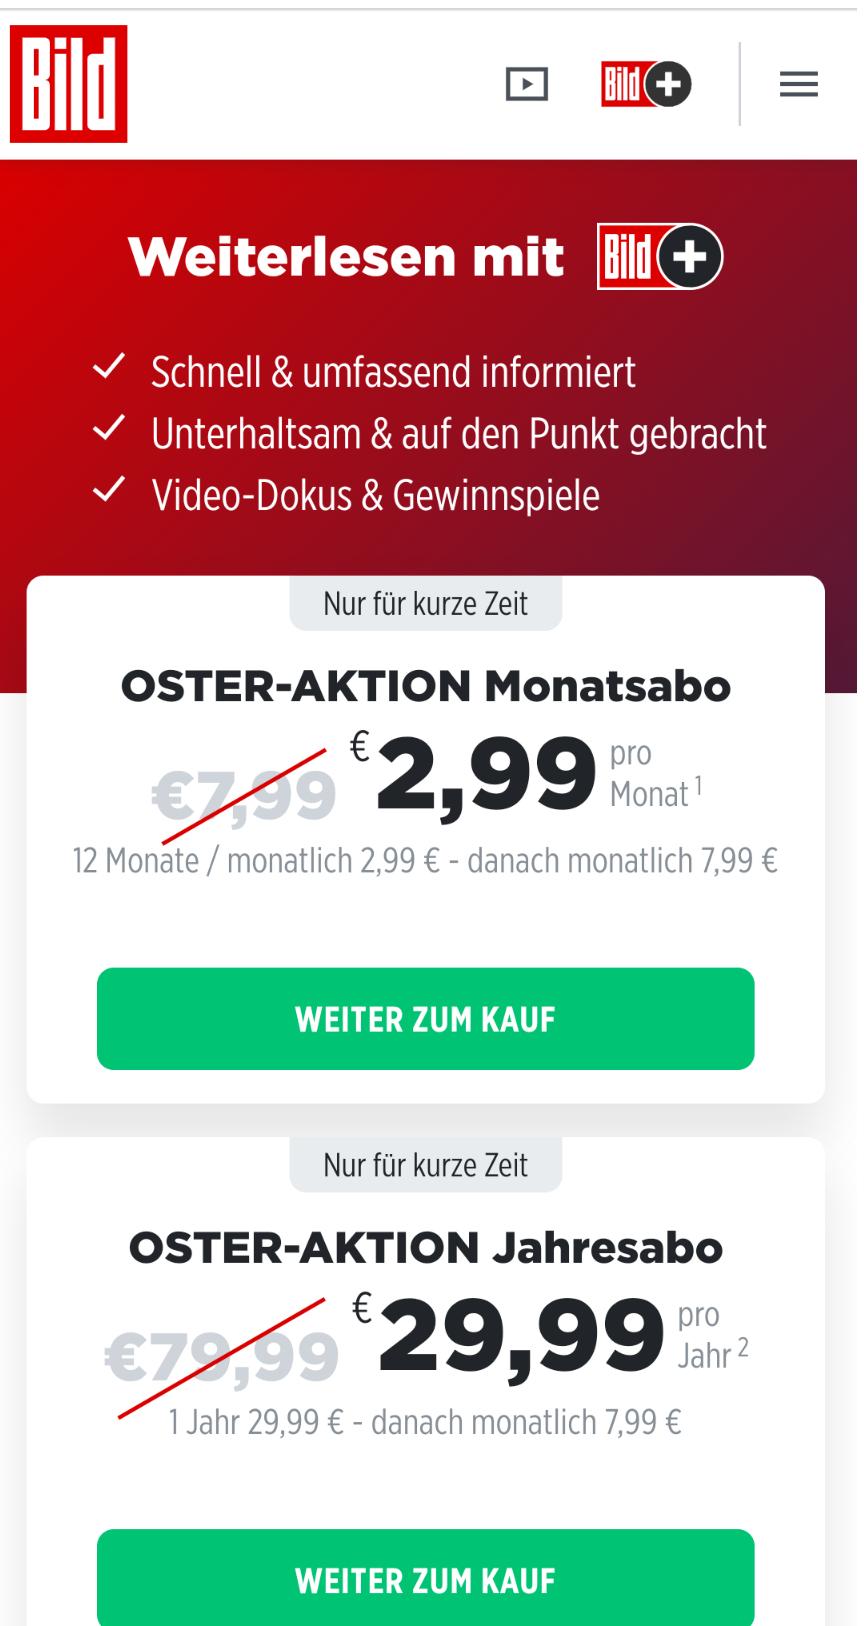 Bild.de 12 Monate 62% günstiger mtl. kündbar - Osteraktion